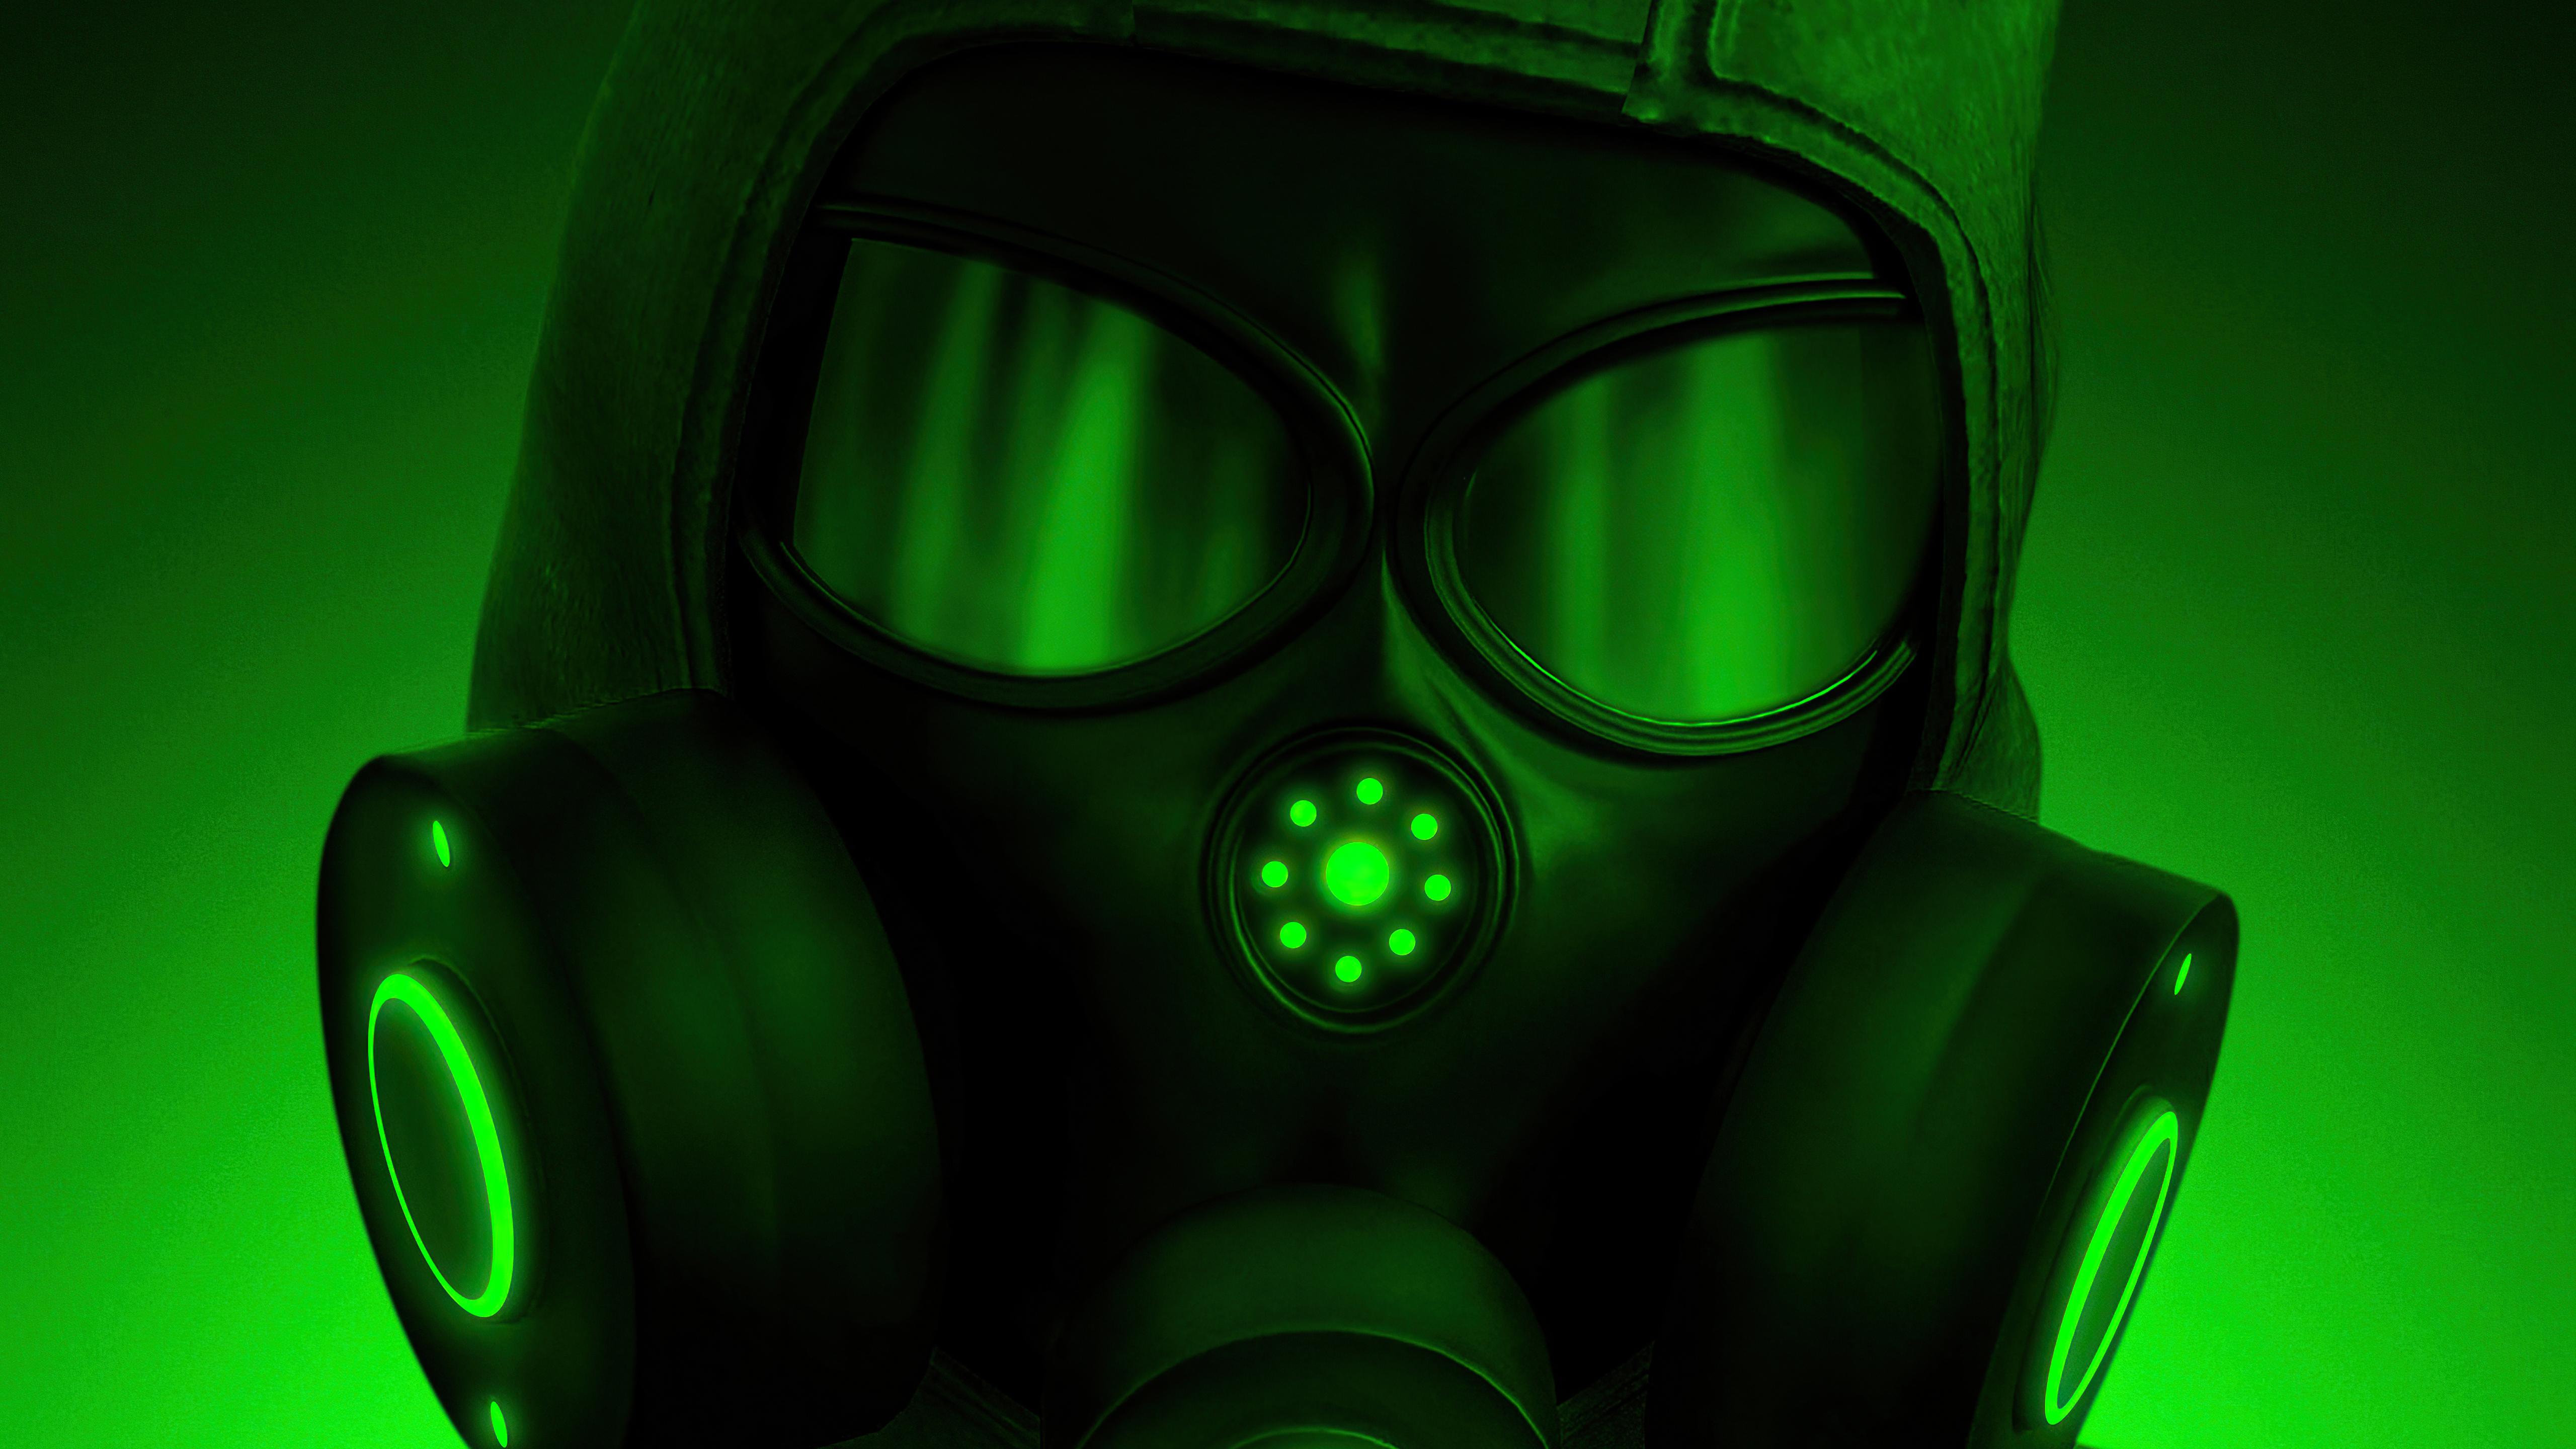 hazardous mask green 4k 1616874394 - Hazardous Mask Green 4k - Hazardous Mask Green 4k wallpapers